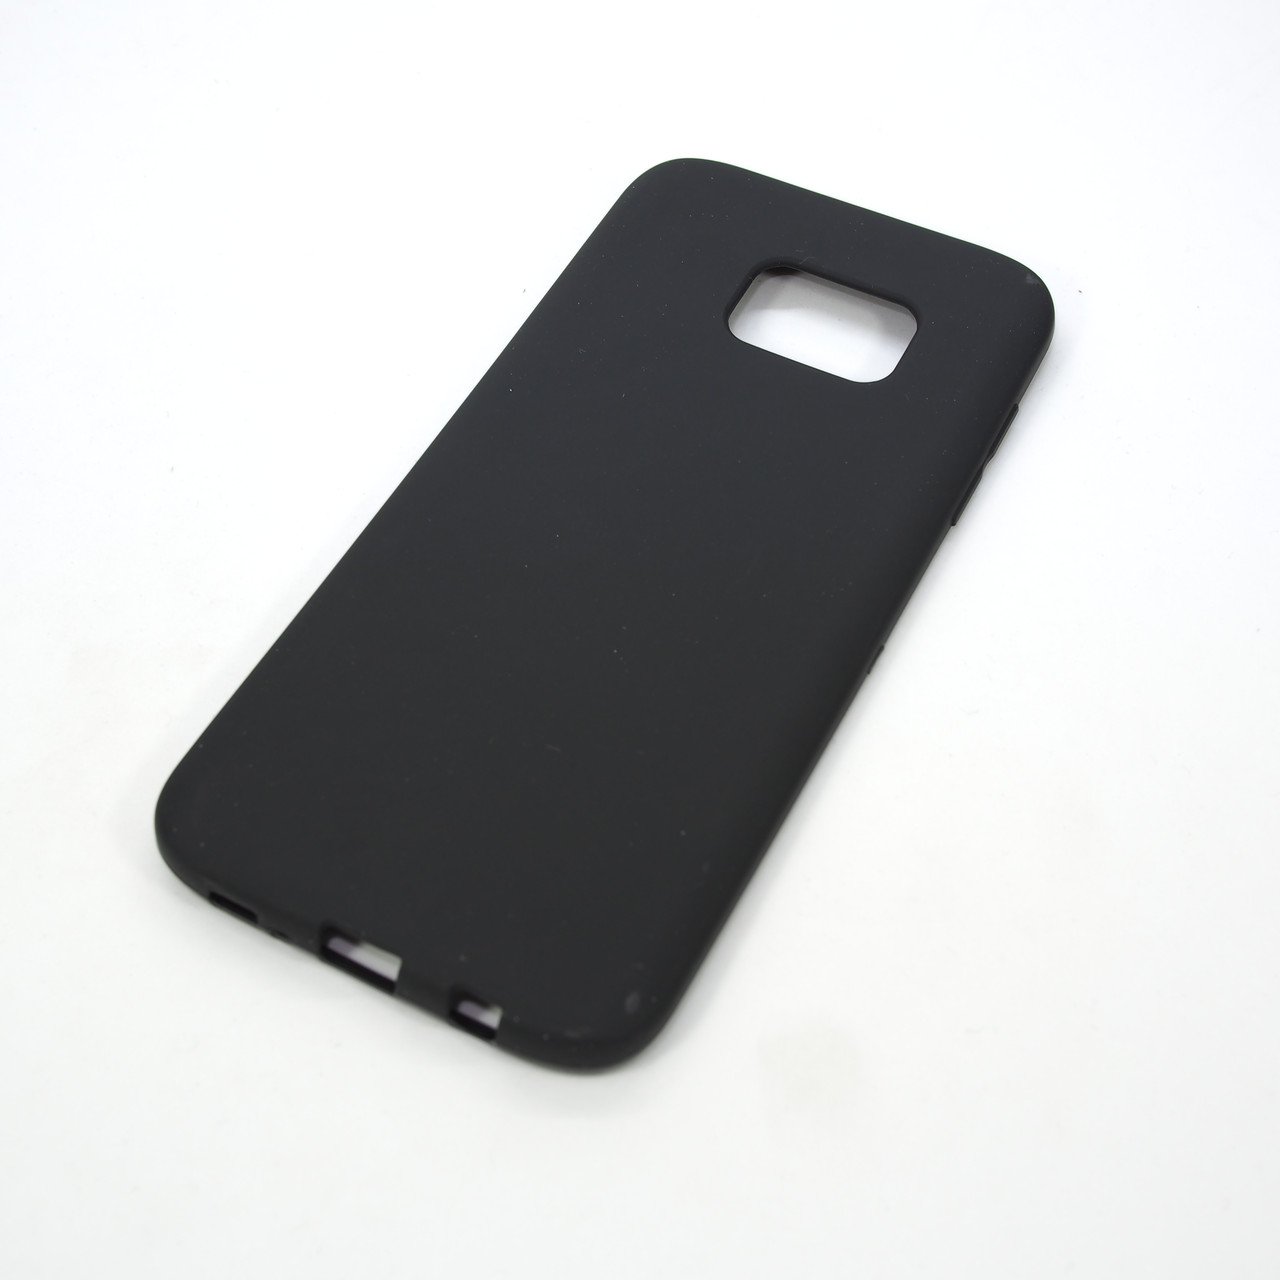 TPU bamper Samsung Galaxy S7 Edge G935 black